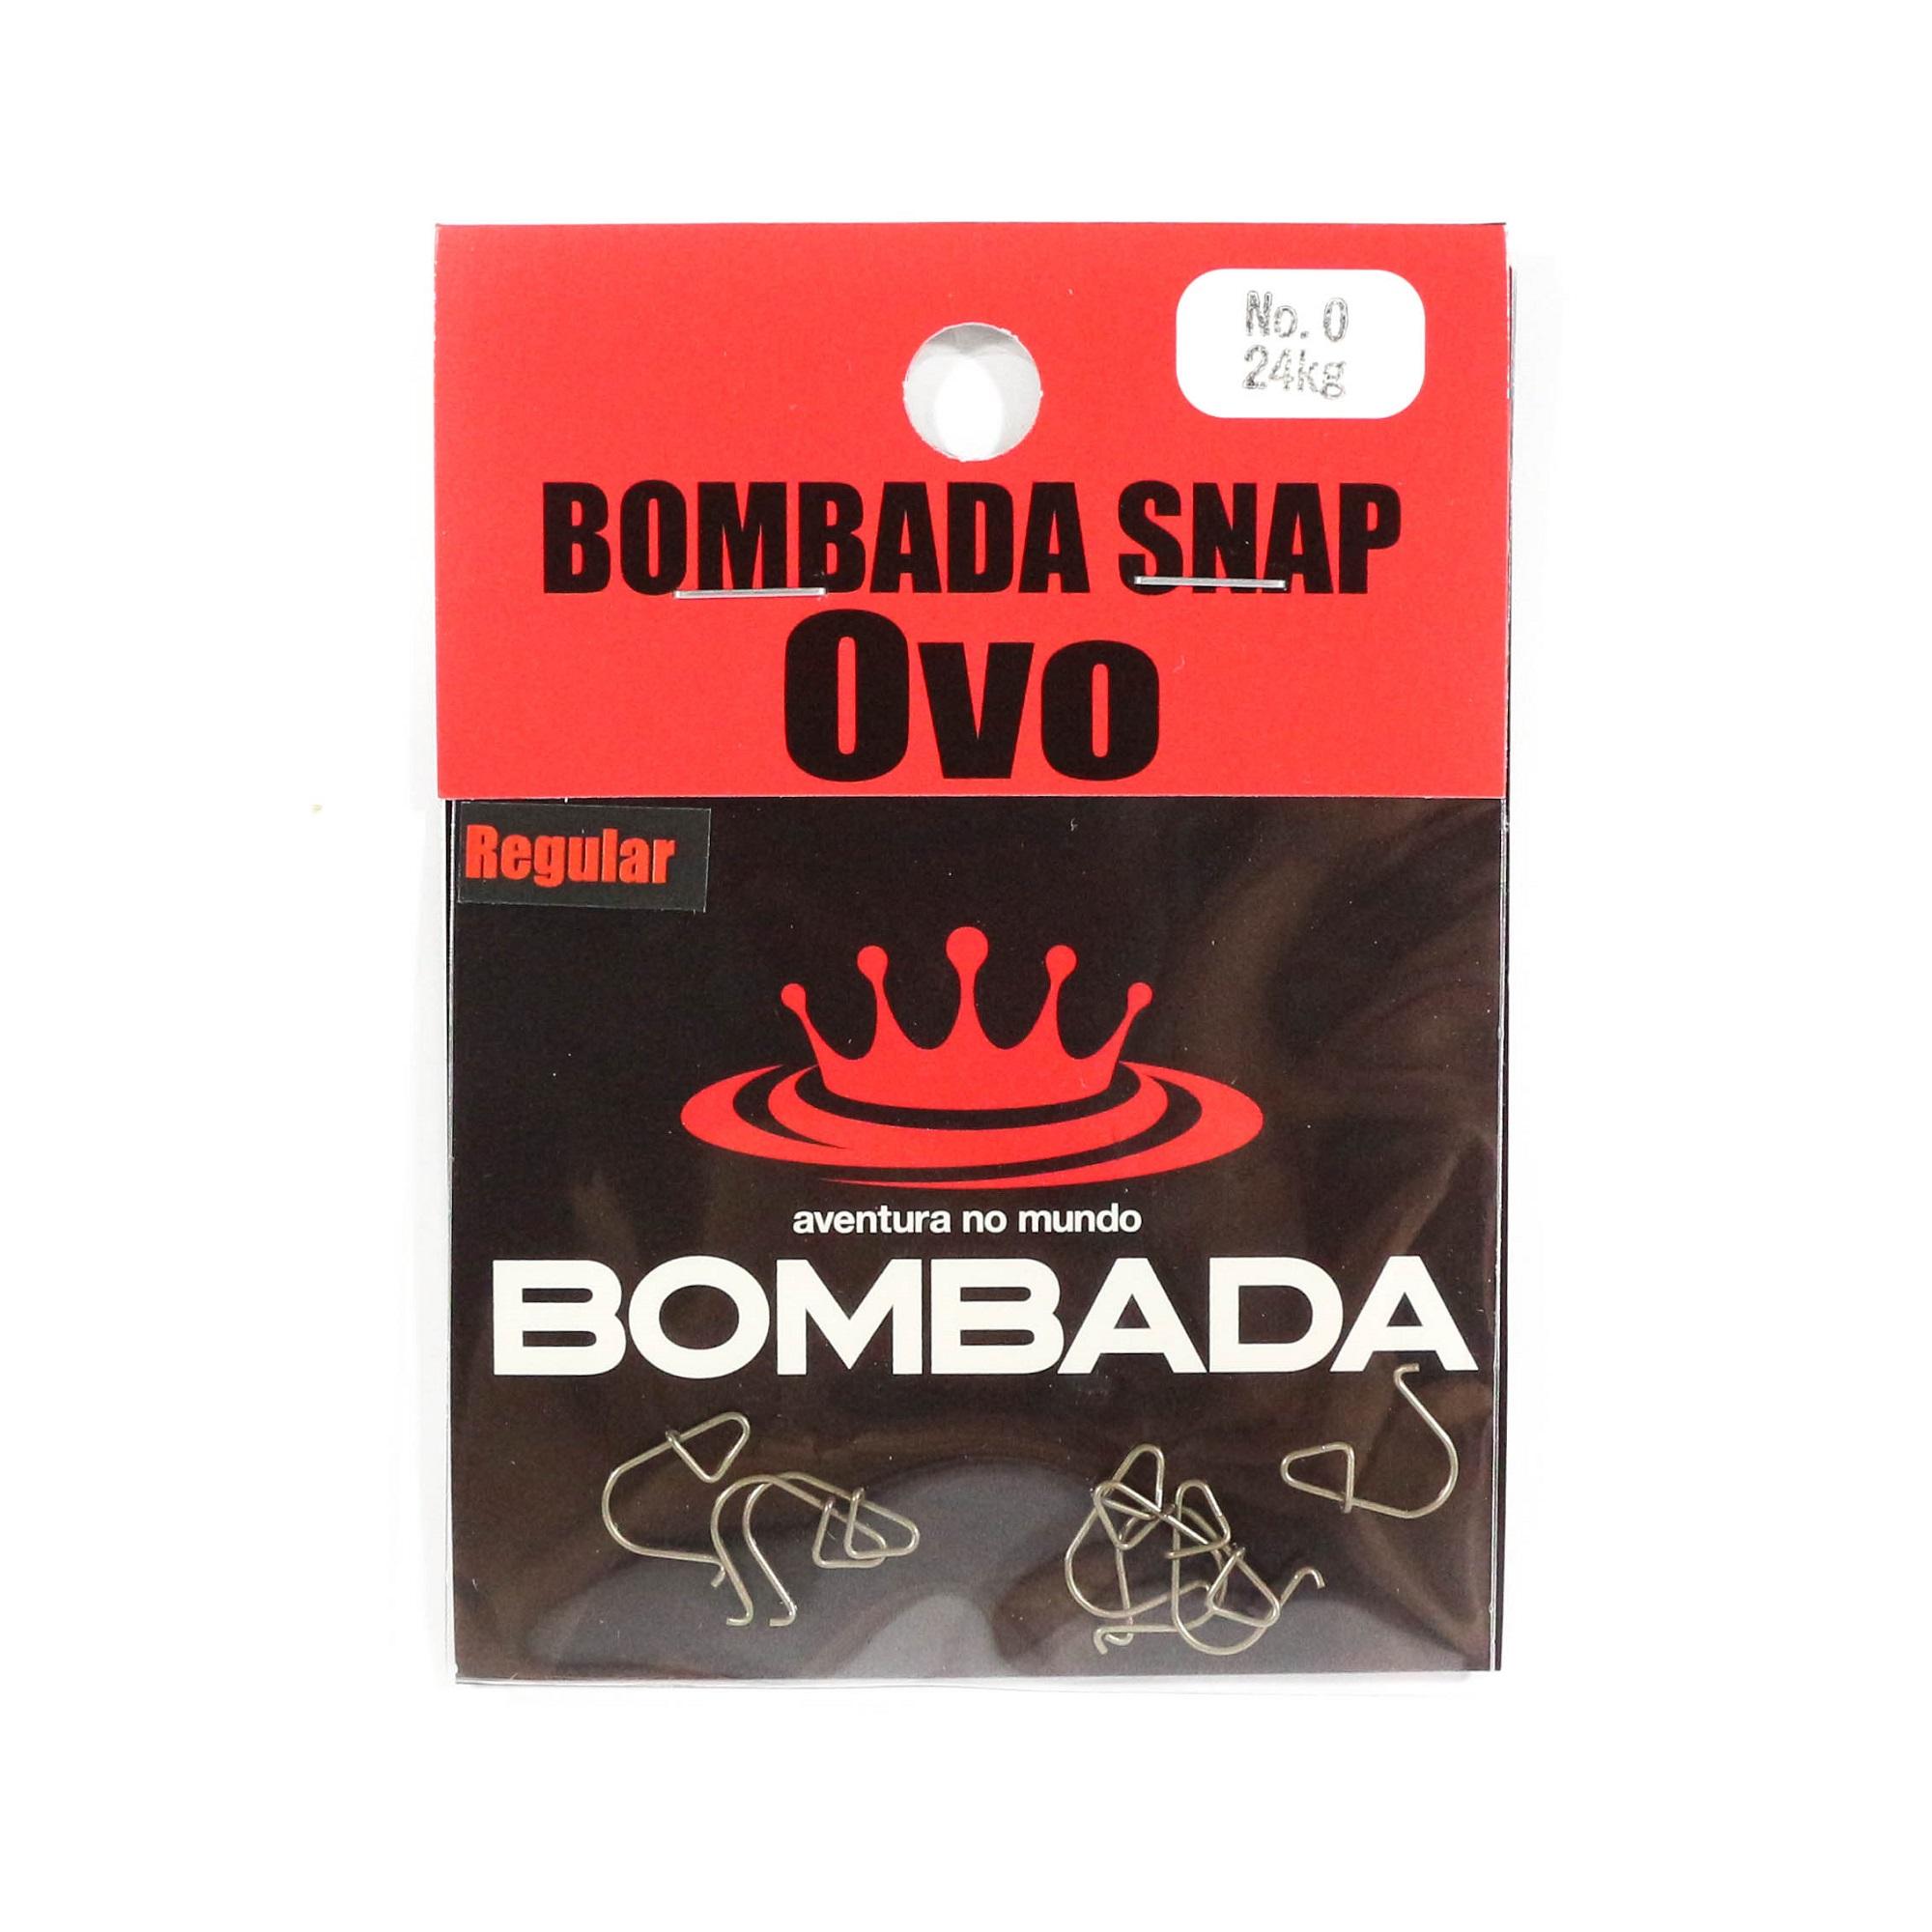 Bombada Lure Snap Ovo Regular Pack Heavy Duty Size 0 (3915)